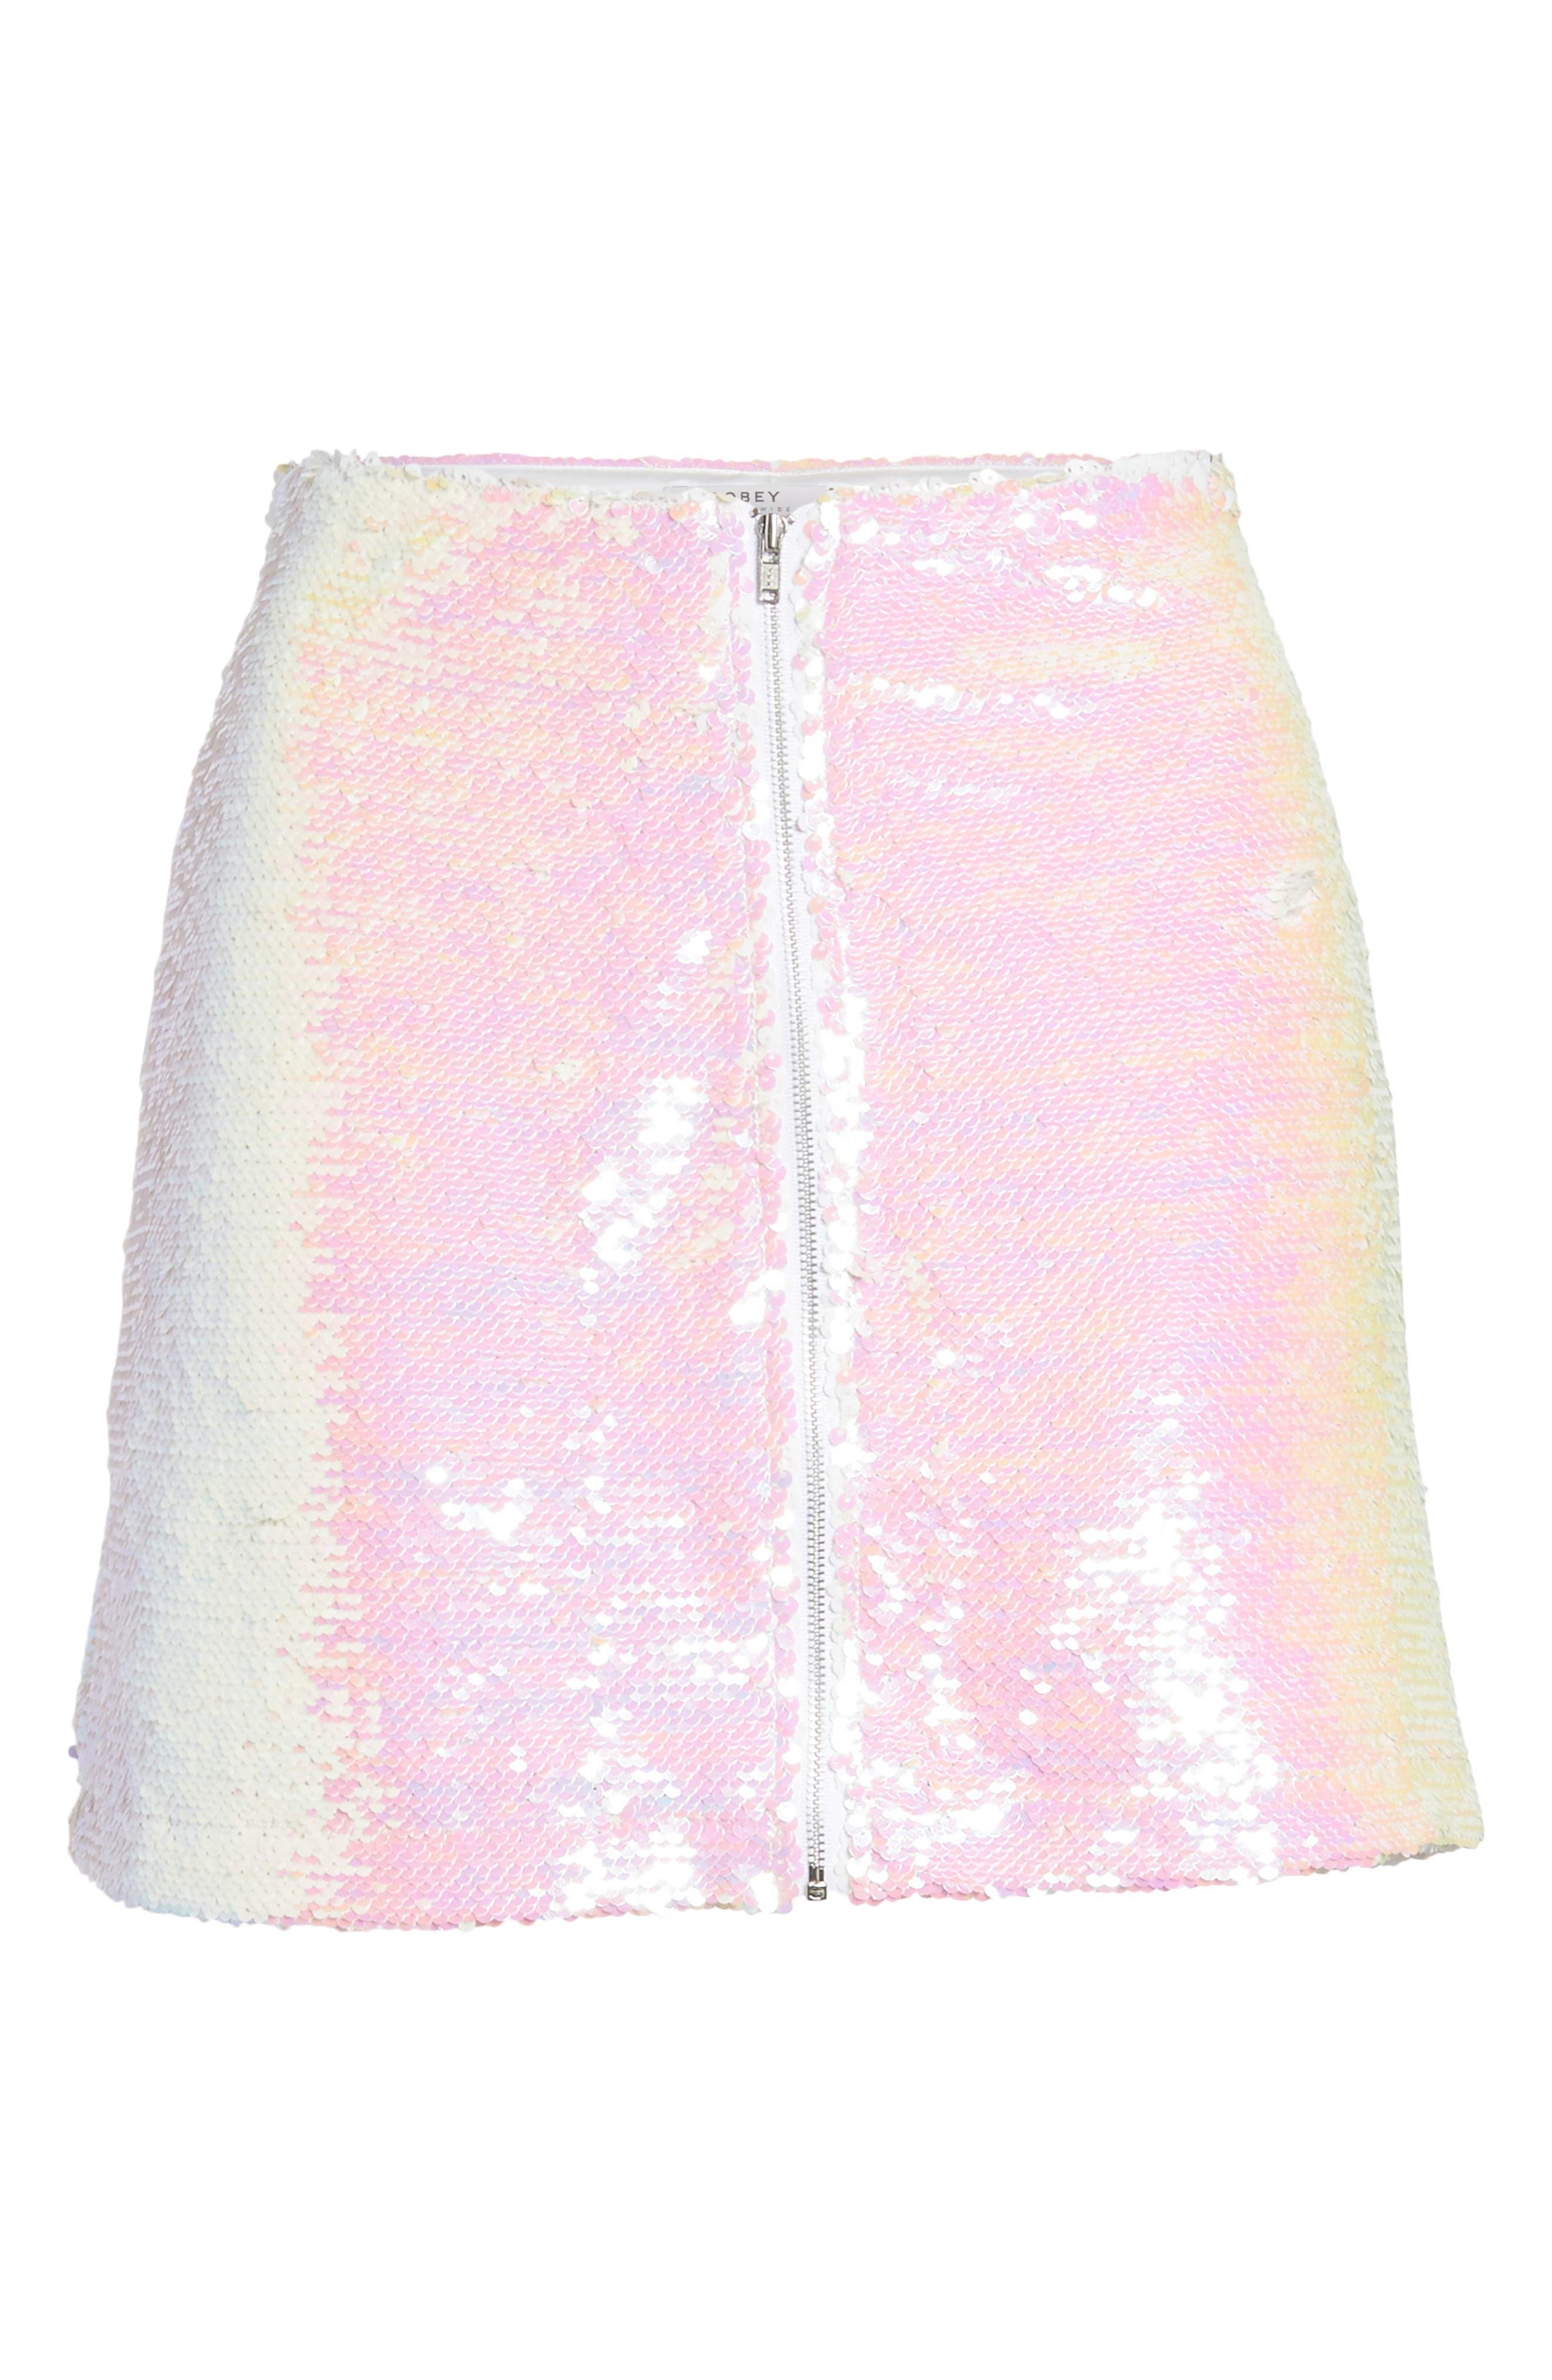 Kool Thing Sequin Skirt,                             Alternate thumbnail 6, color,                             Pink Multi